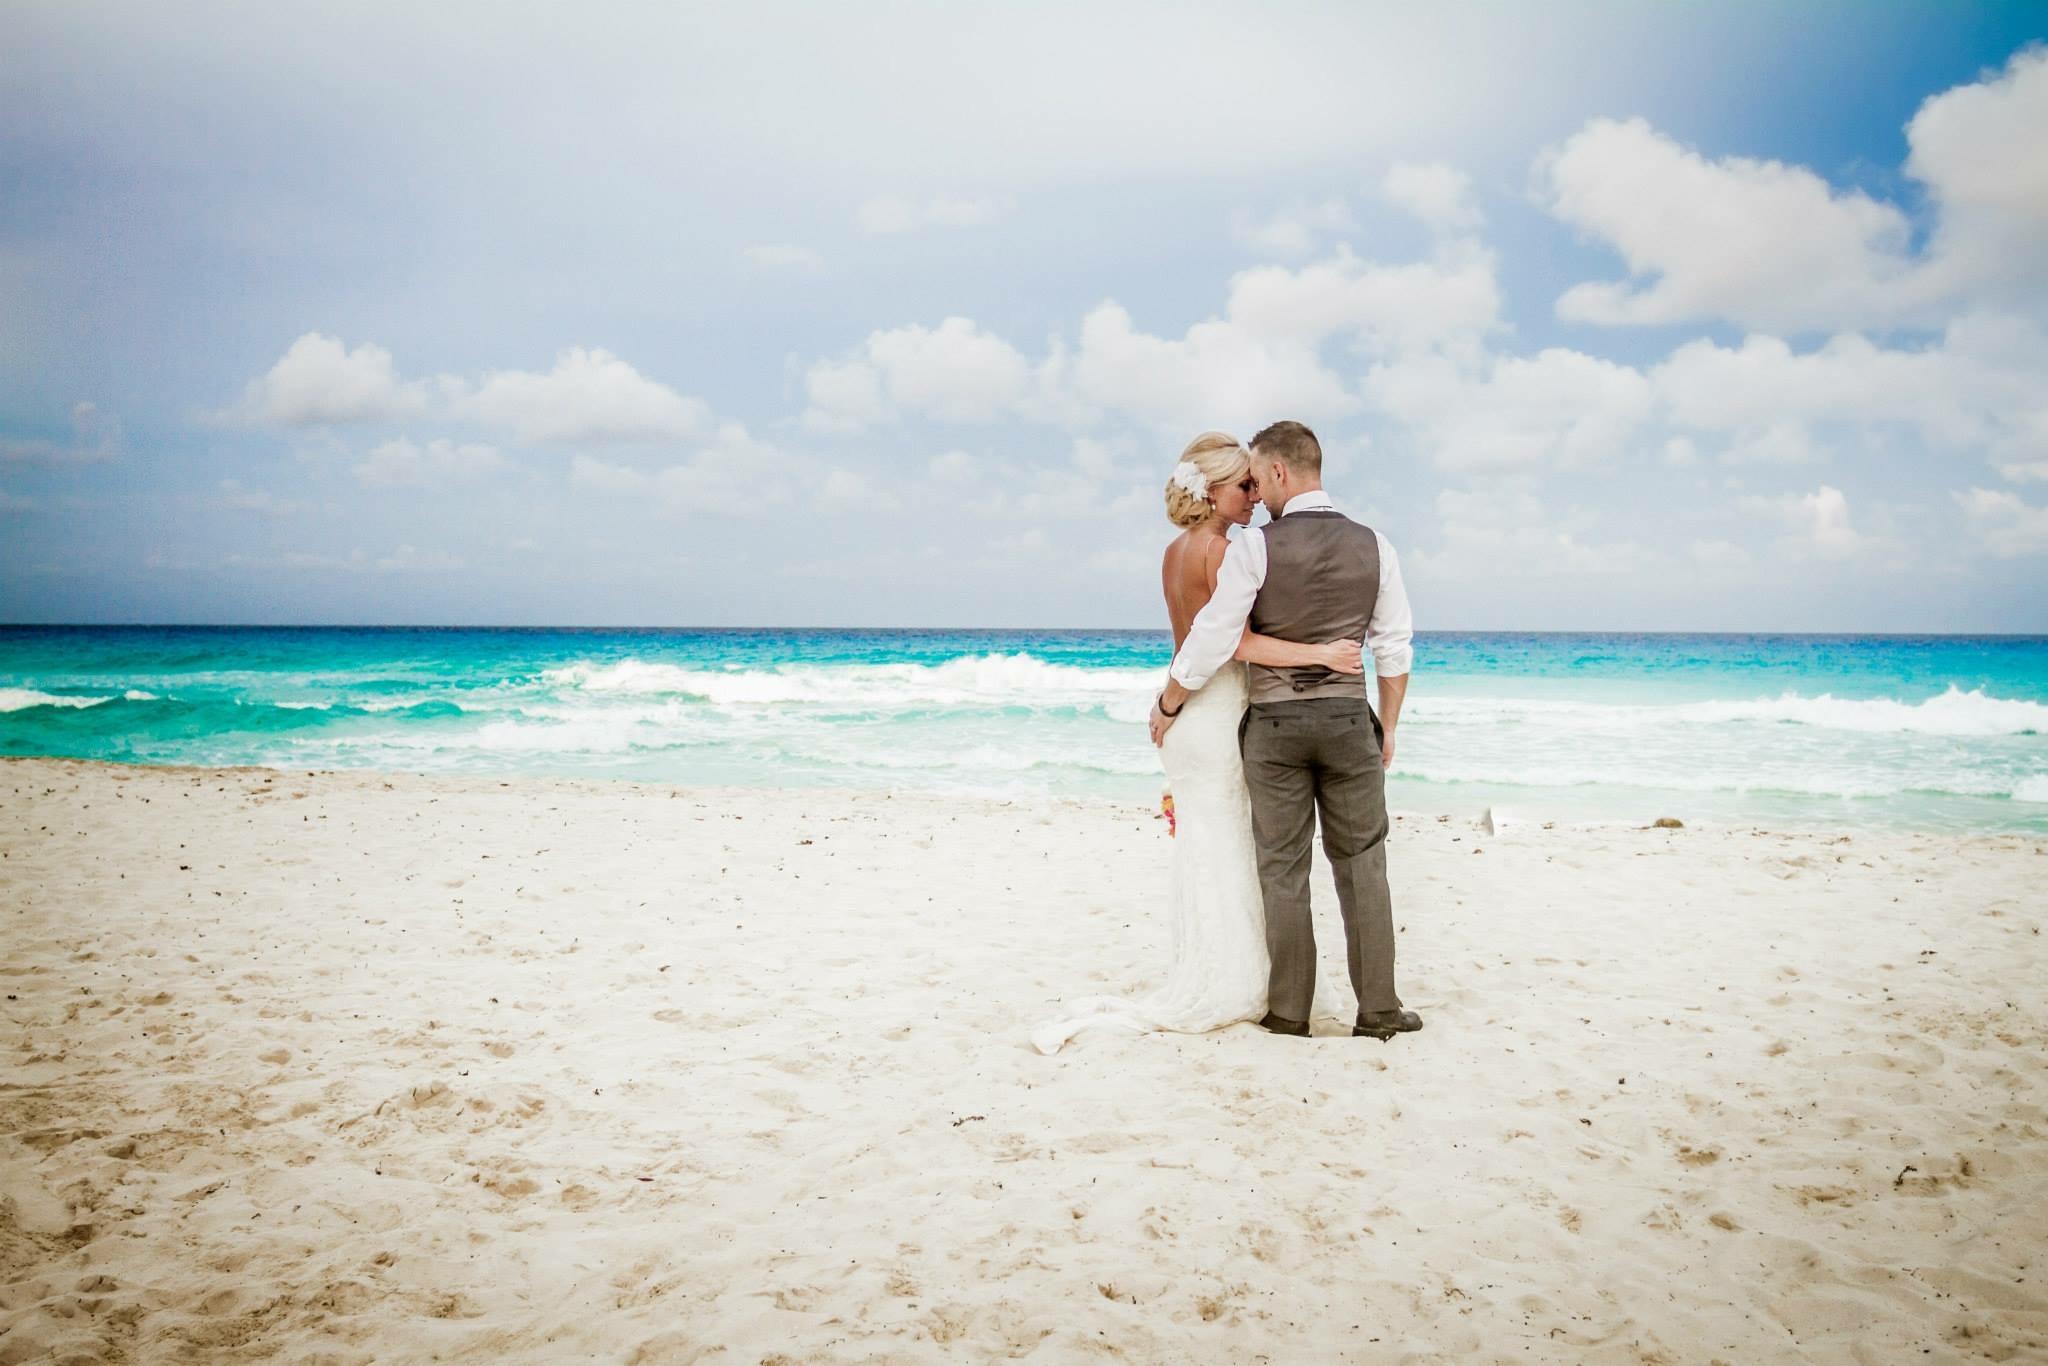 krysten-reed-cancun-beach-wedding-24.JPG